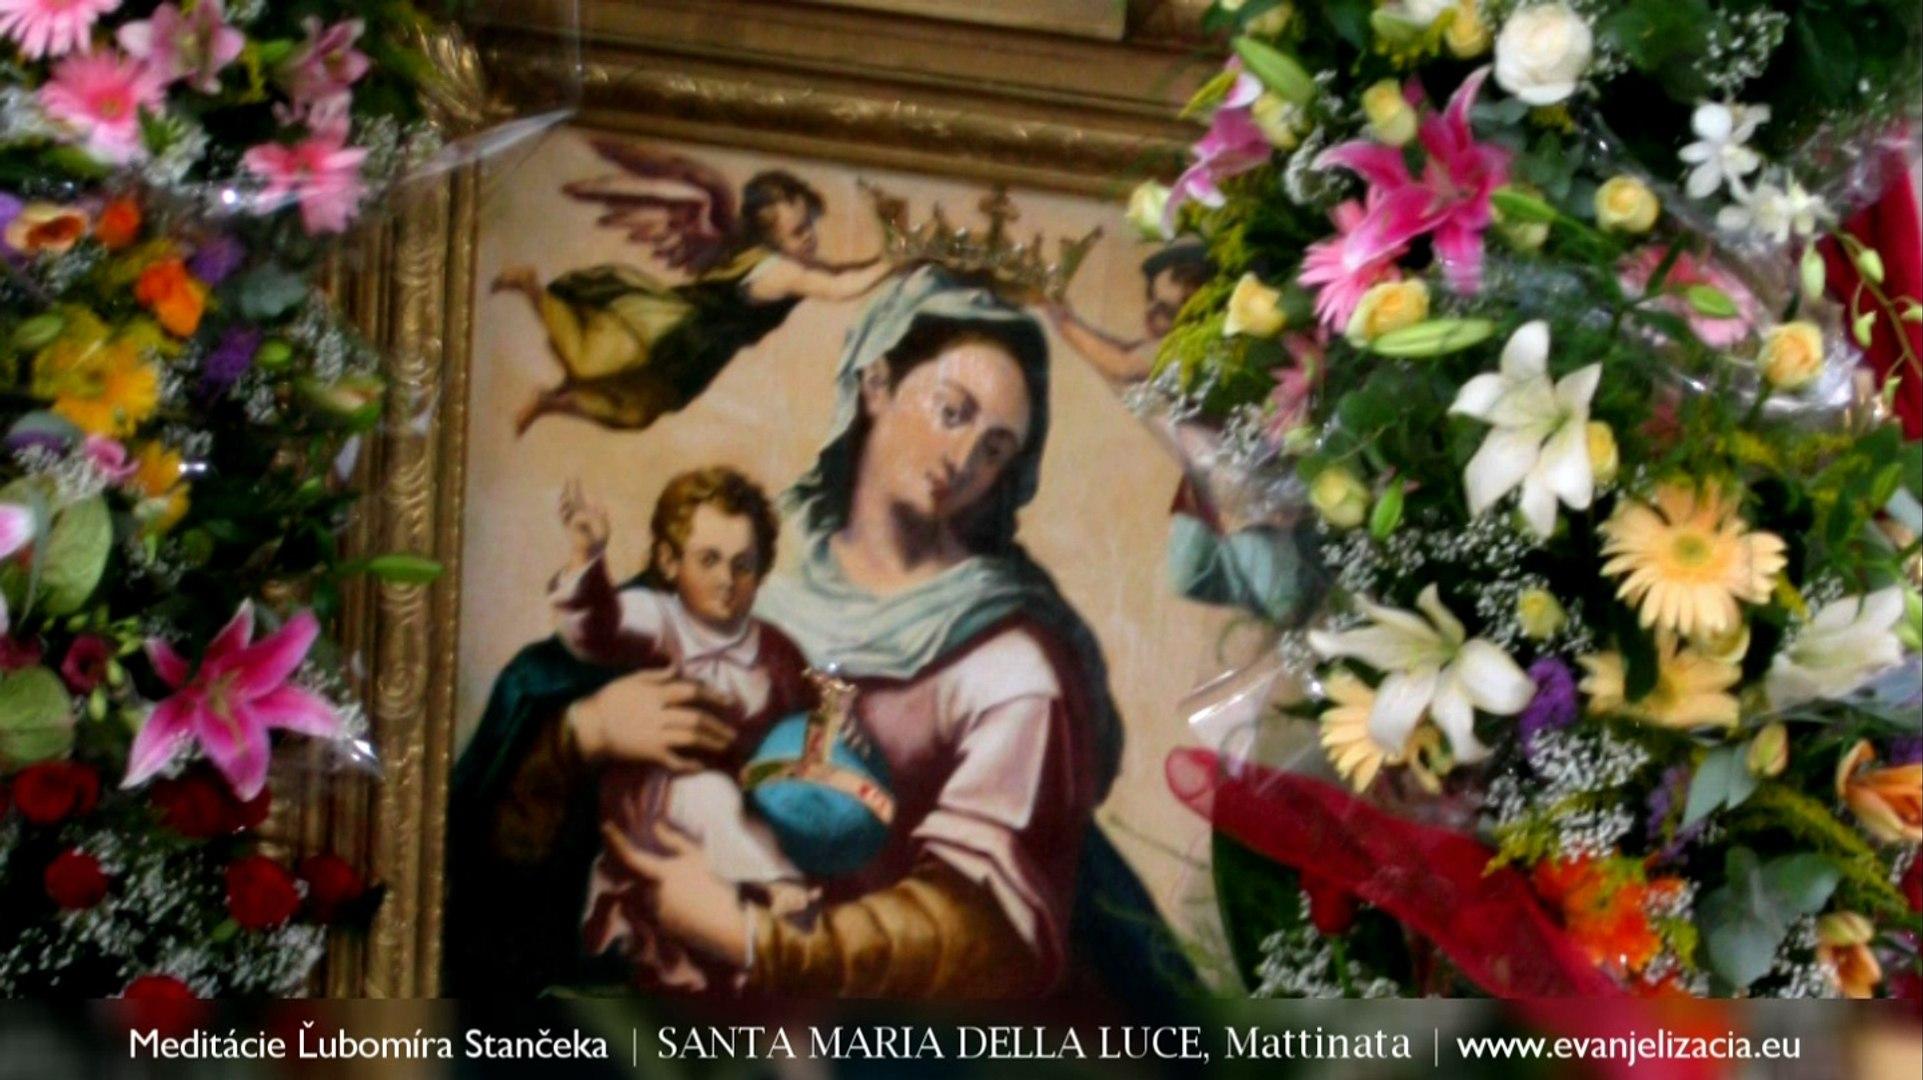 † Meditácie Ľubomíra Stančeka | Sloboda Jn 6,60-69 | Chiesa Santa Maria della Luce, Mattinata